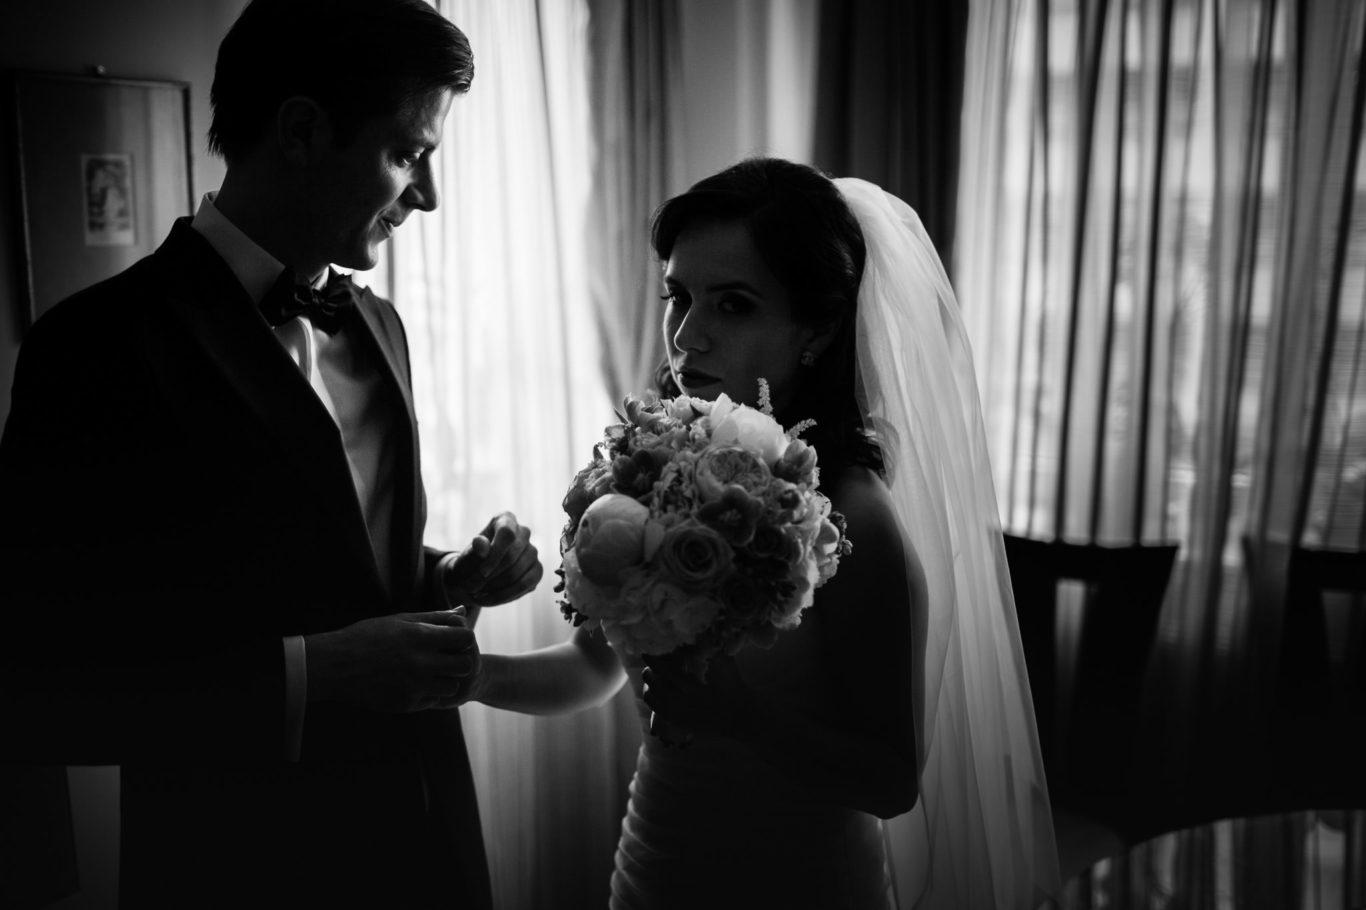 0333-Fotografie-nunta-Simona-Valentin-fotograf-Ciprian-Dumitrescu-CDF_8897